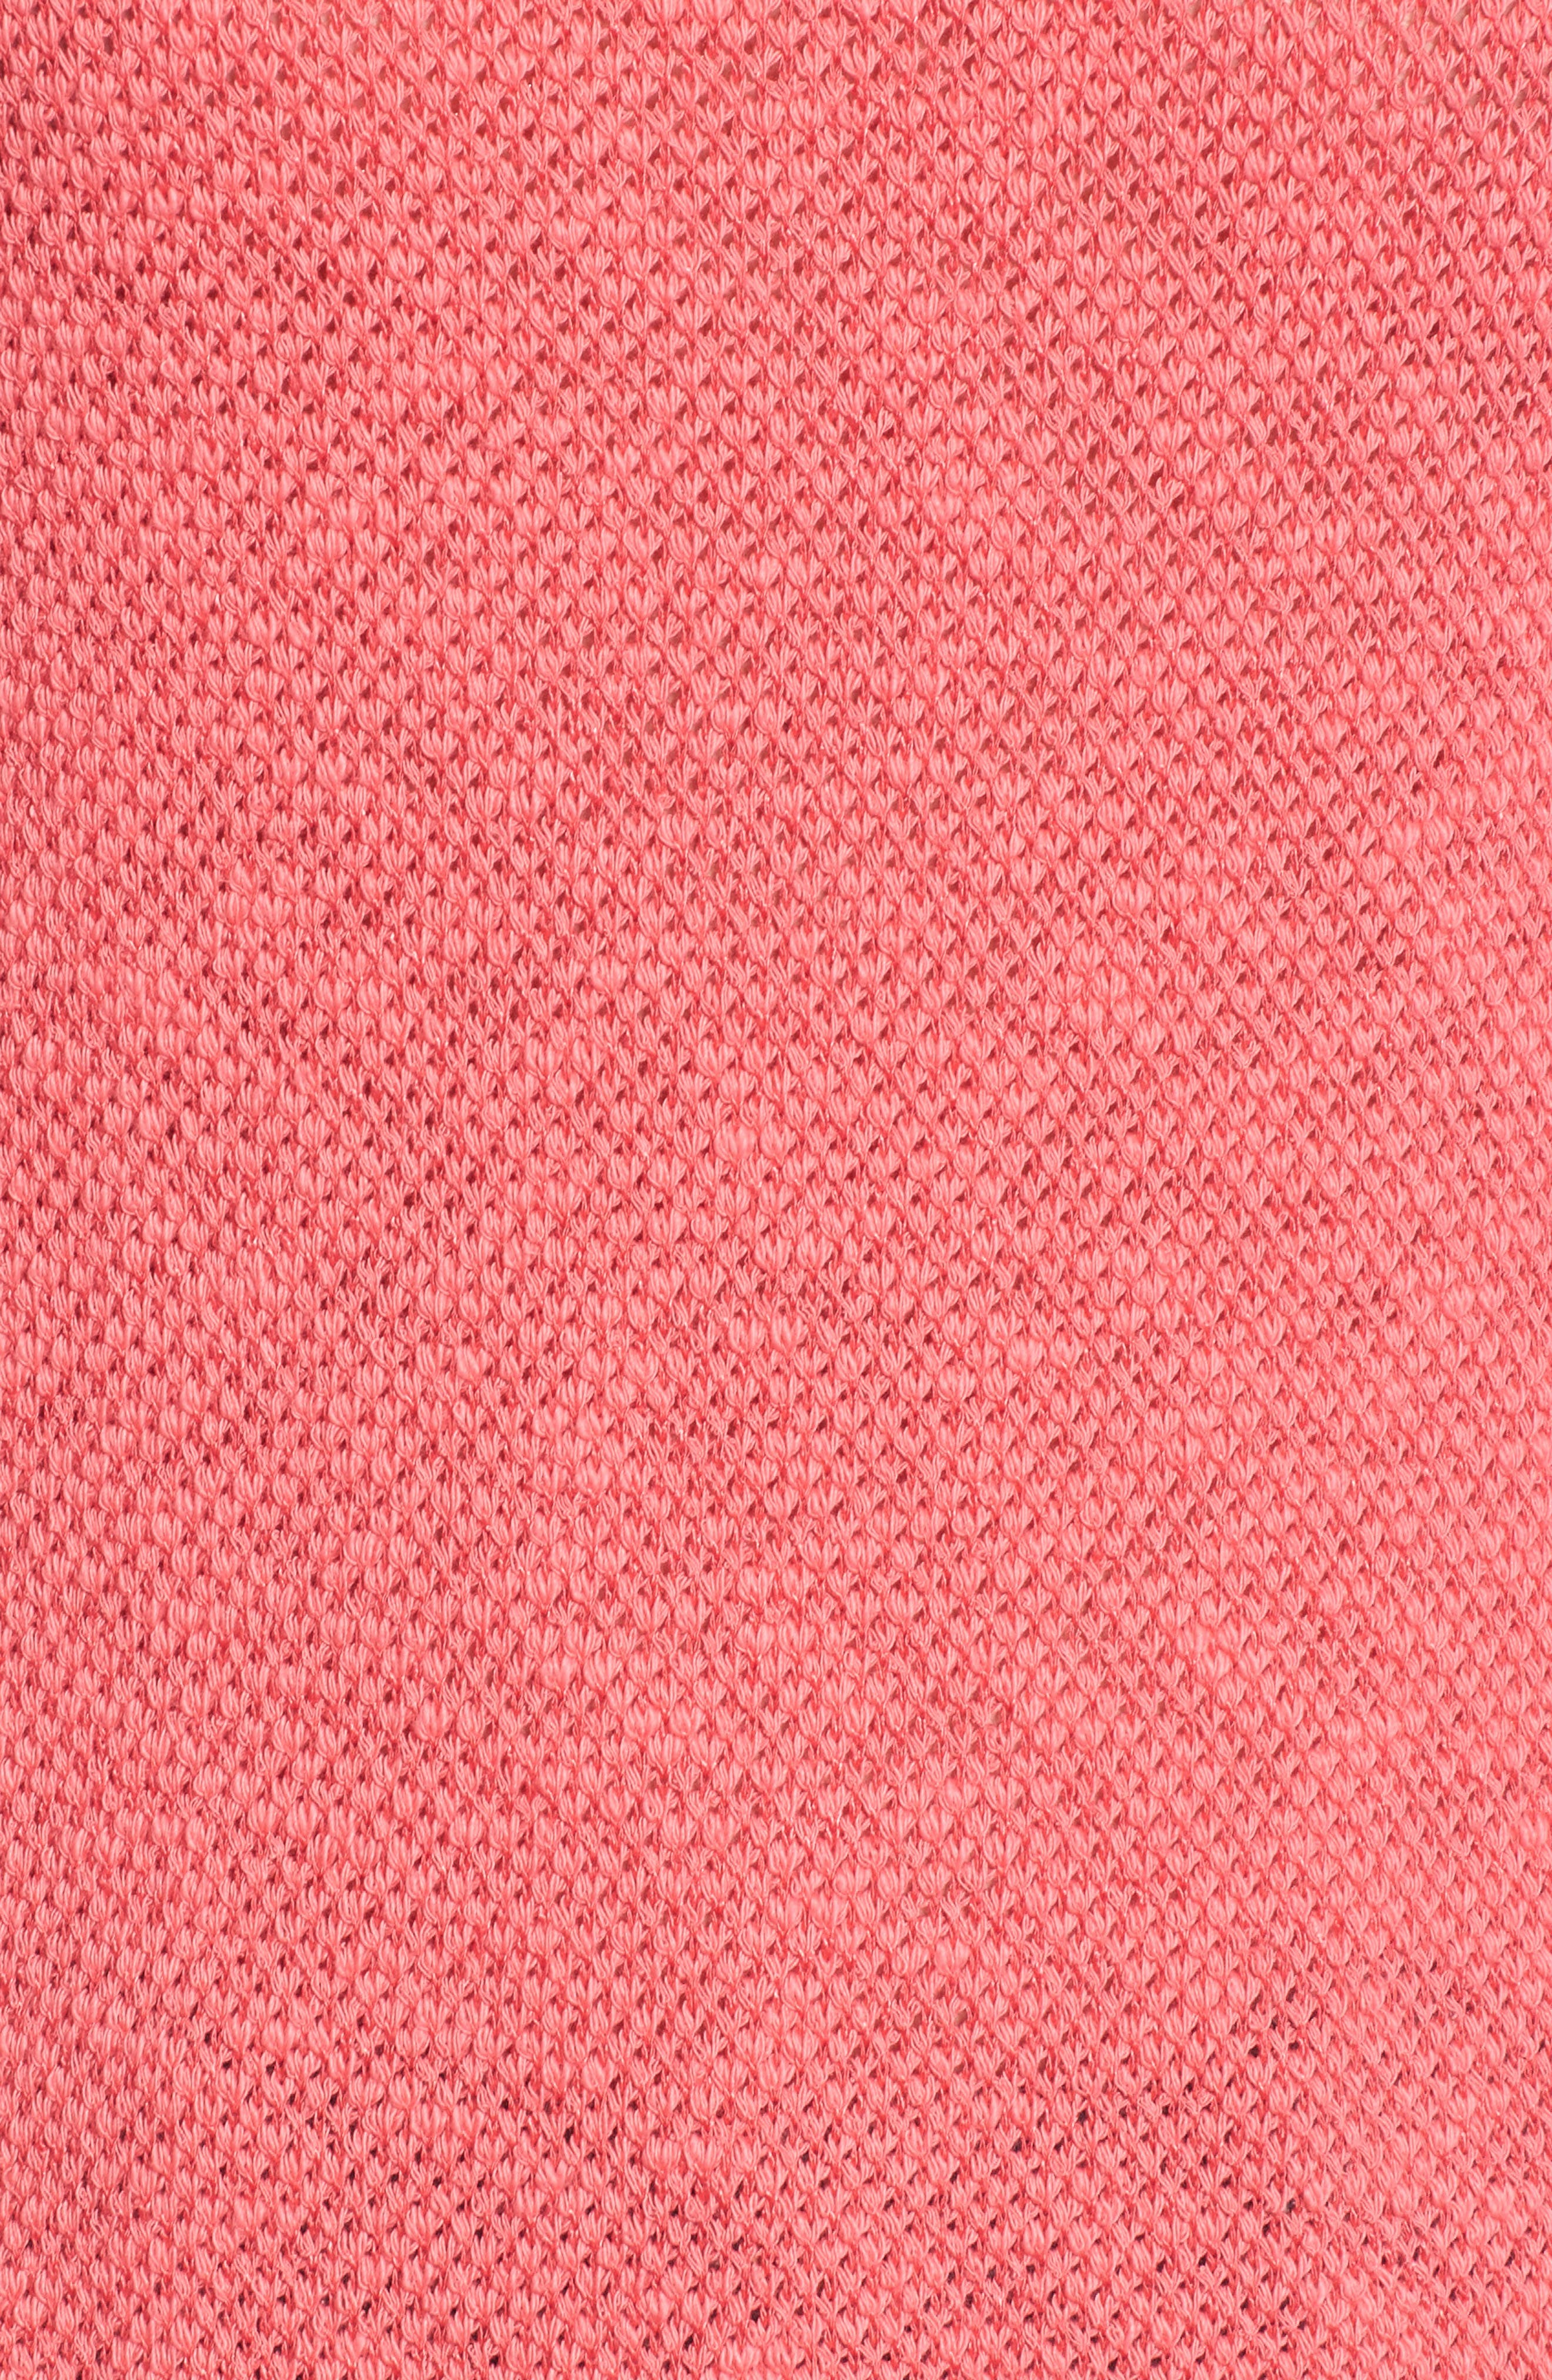 Convertible Neck Knit Pullover,                             Alternate thumbnail 6, color,                             Pink Ribbon